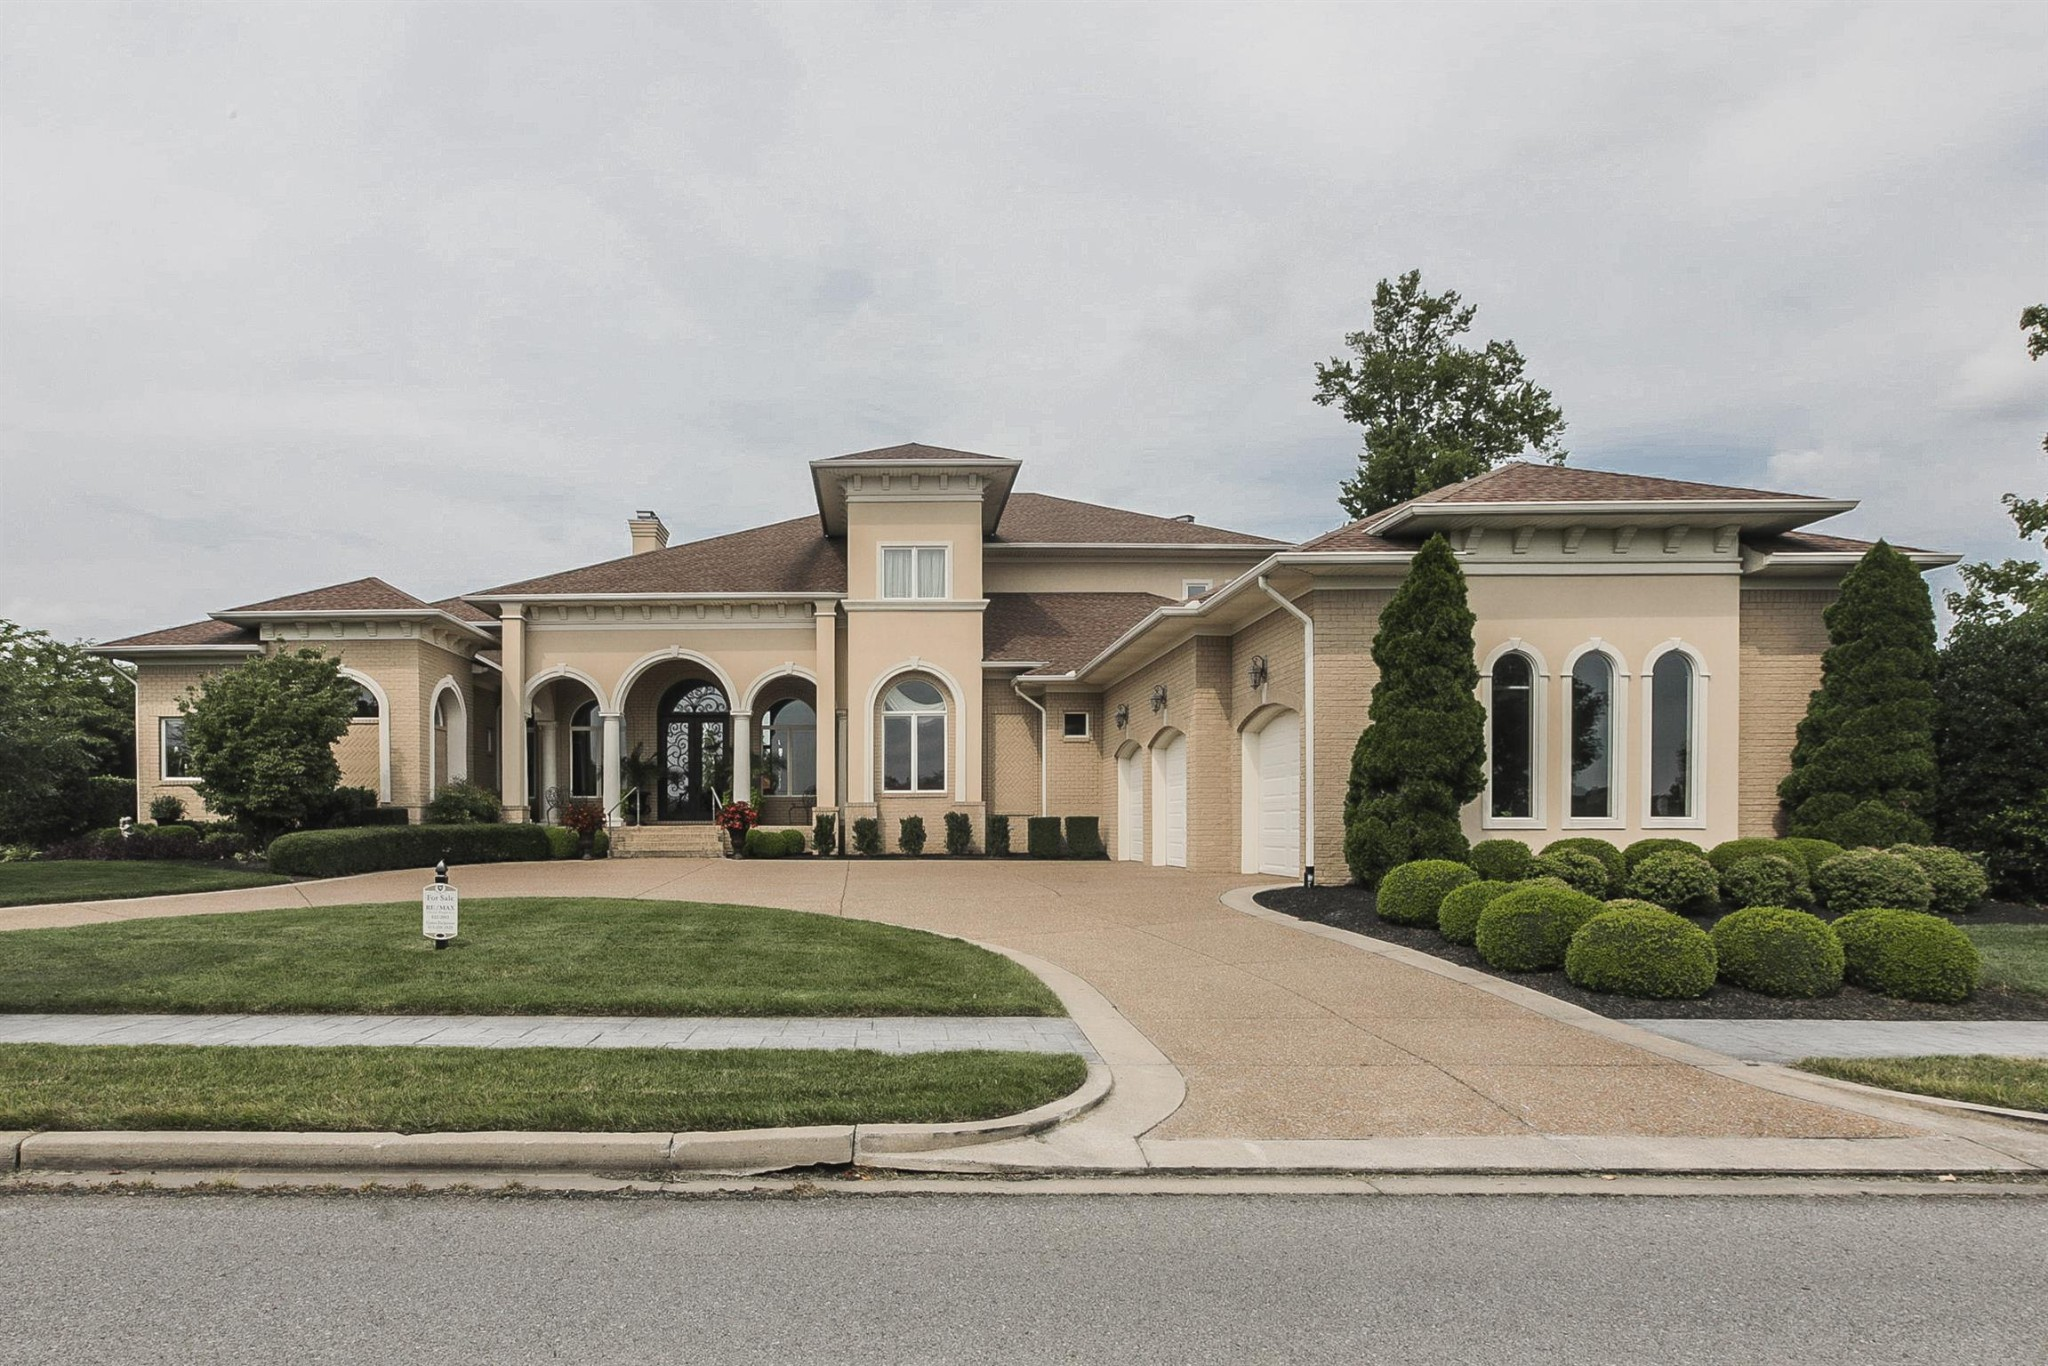 1110 Plantation Blvd Property Photo - Gallatin, TN real estate listing